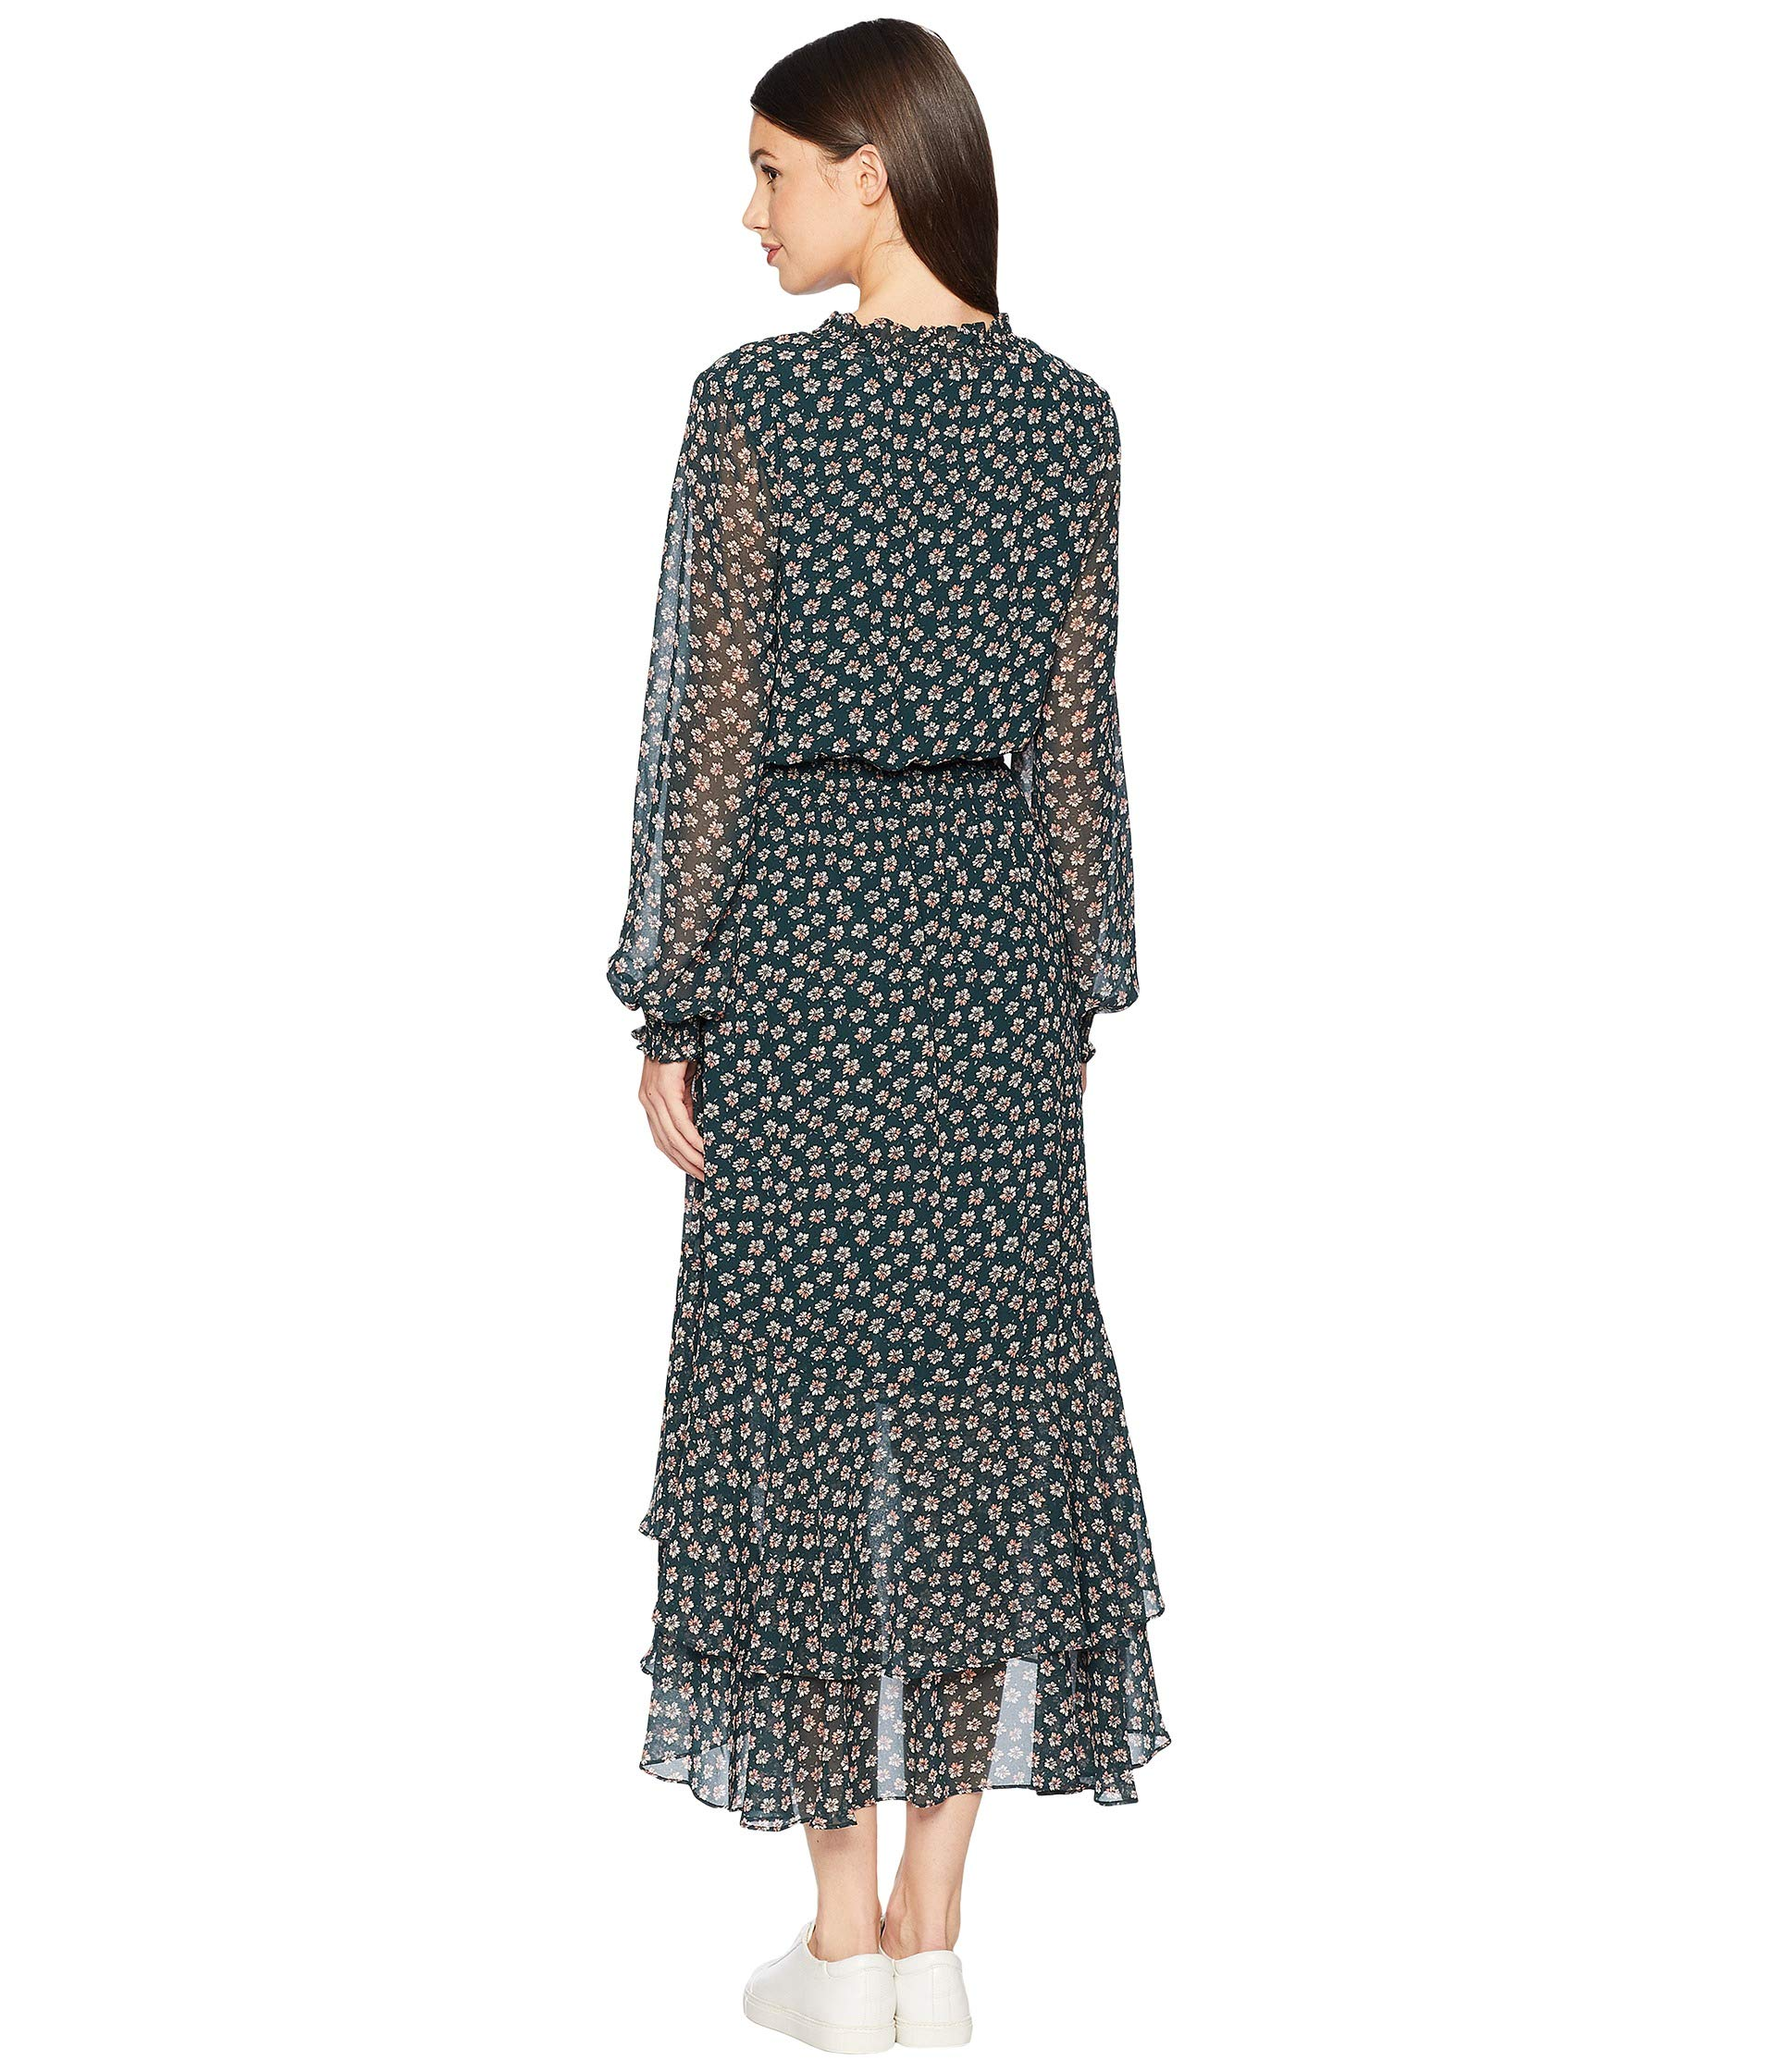 1 Attire low Sleeve Long High state Ditsy Dress Neck Mock Pine PI4rIq6